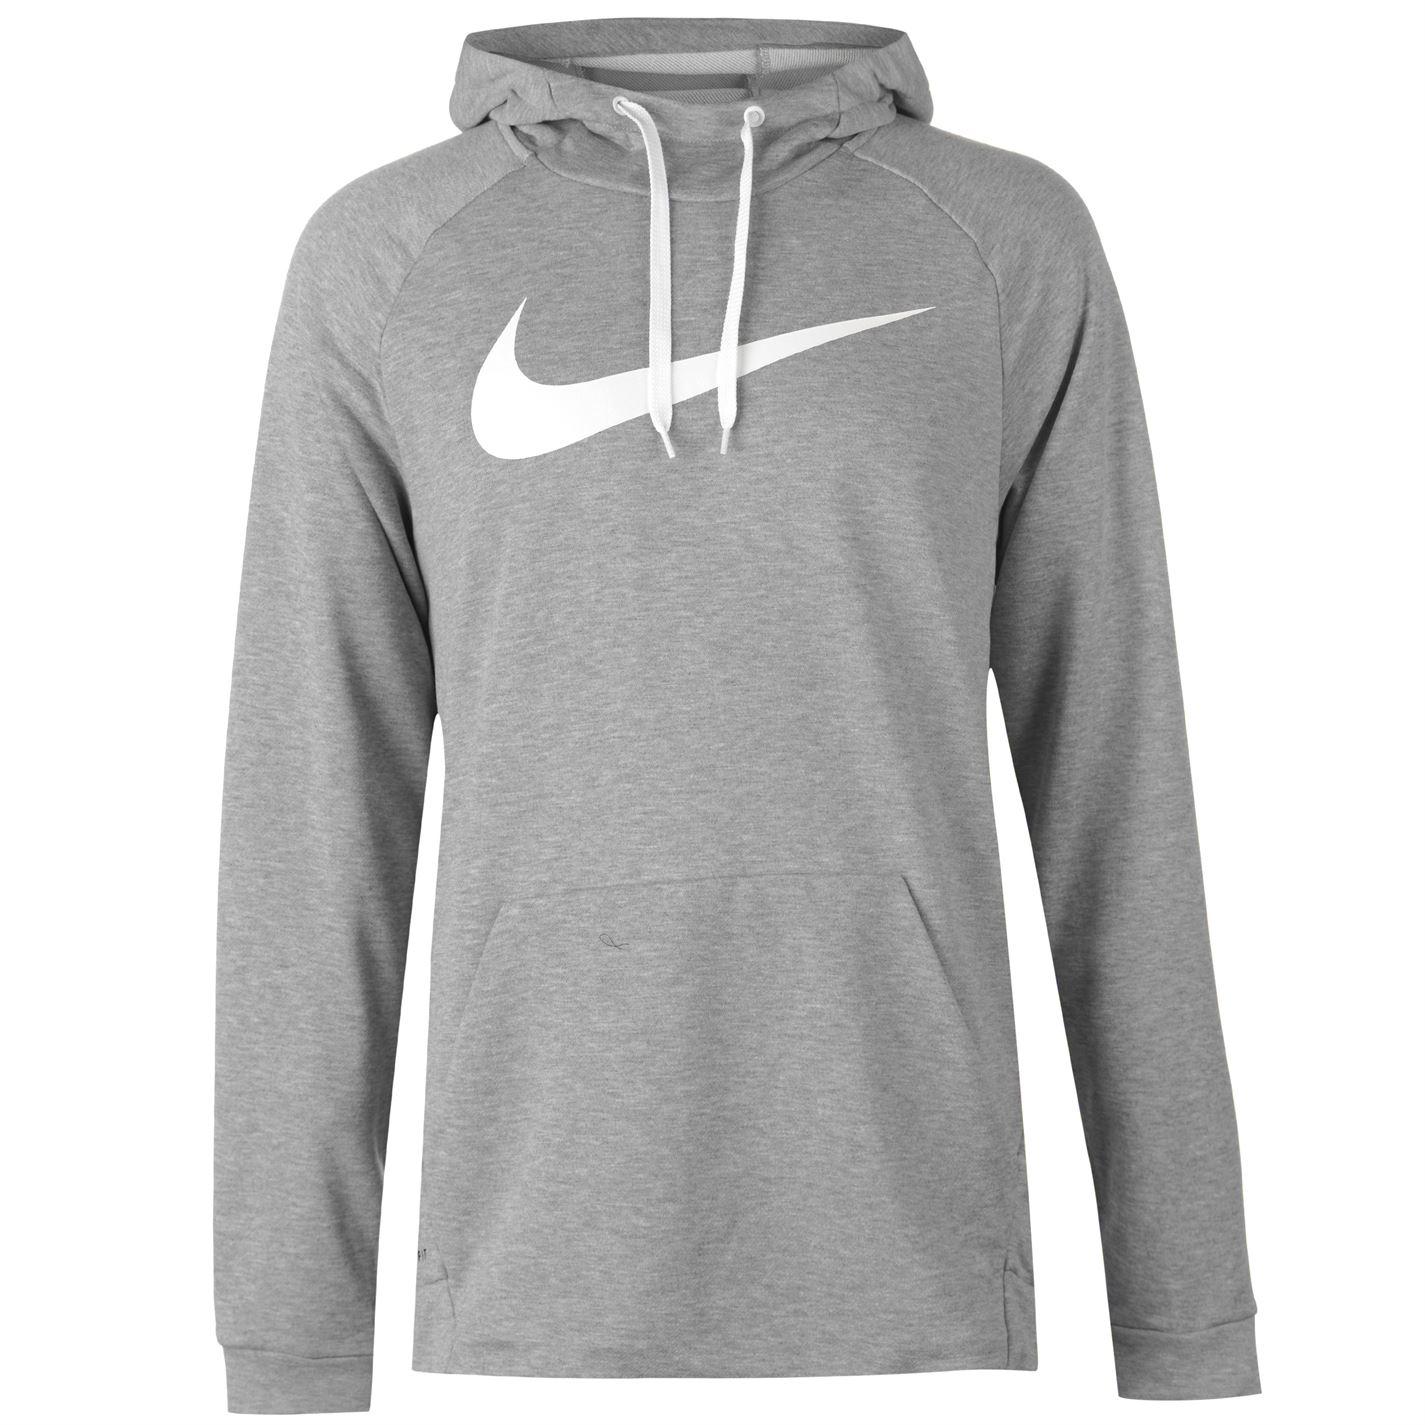 Nike Dry Swoosh pánska mikina